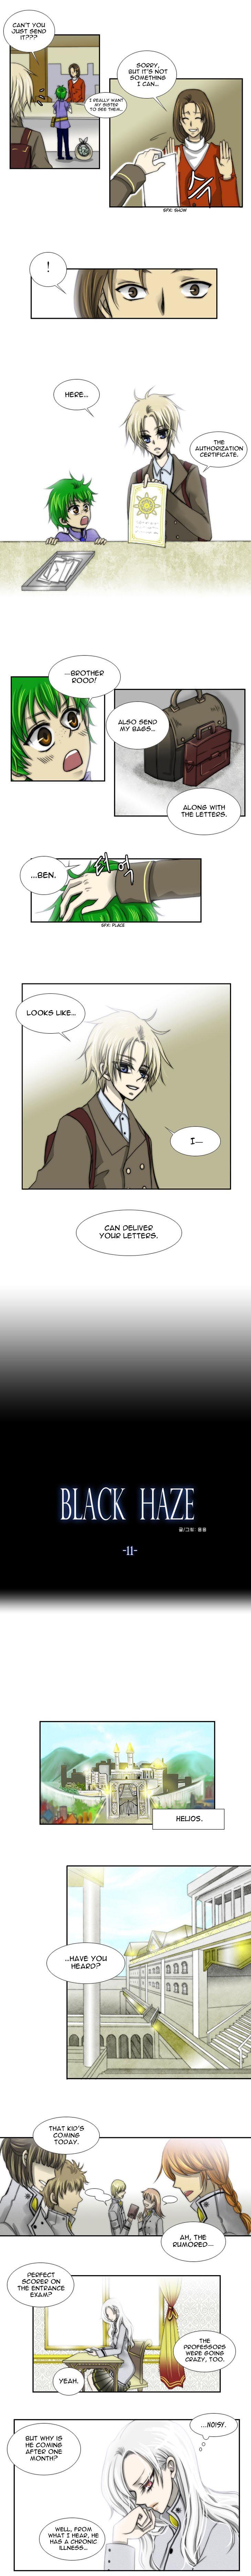 Black Haze 11 Page 2